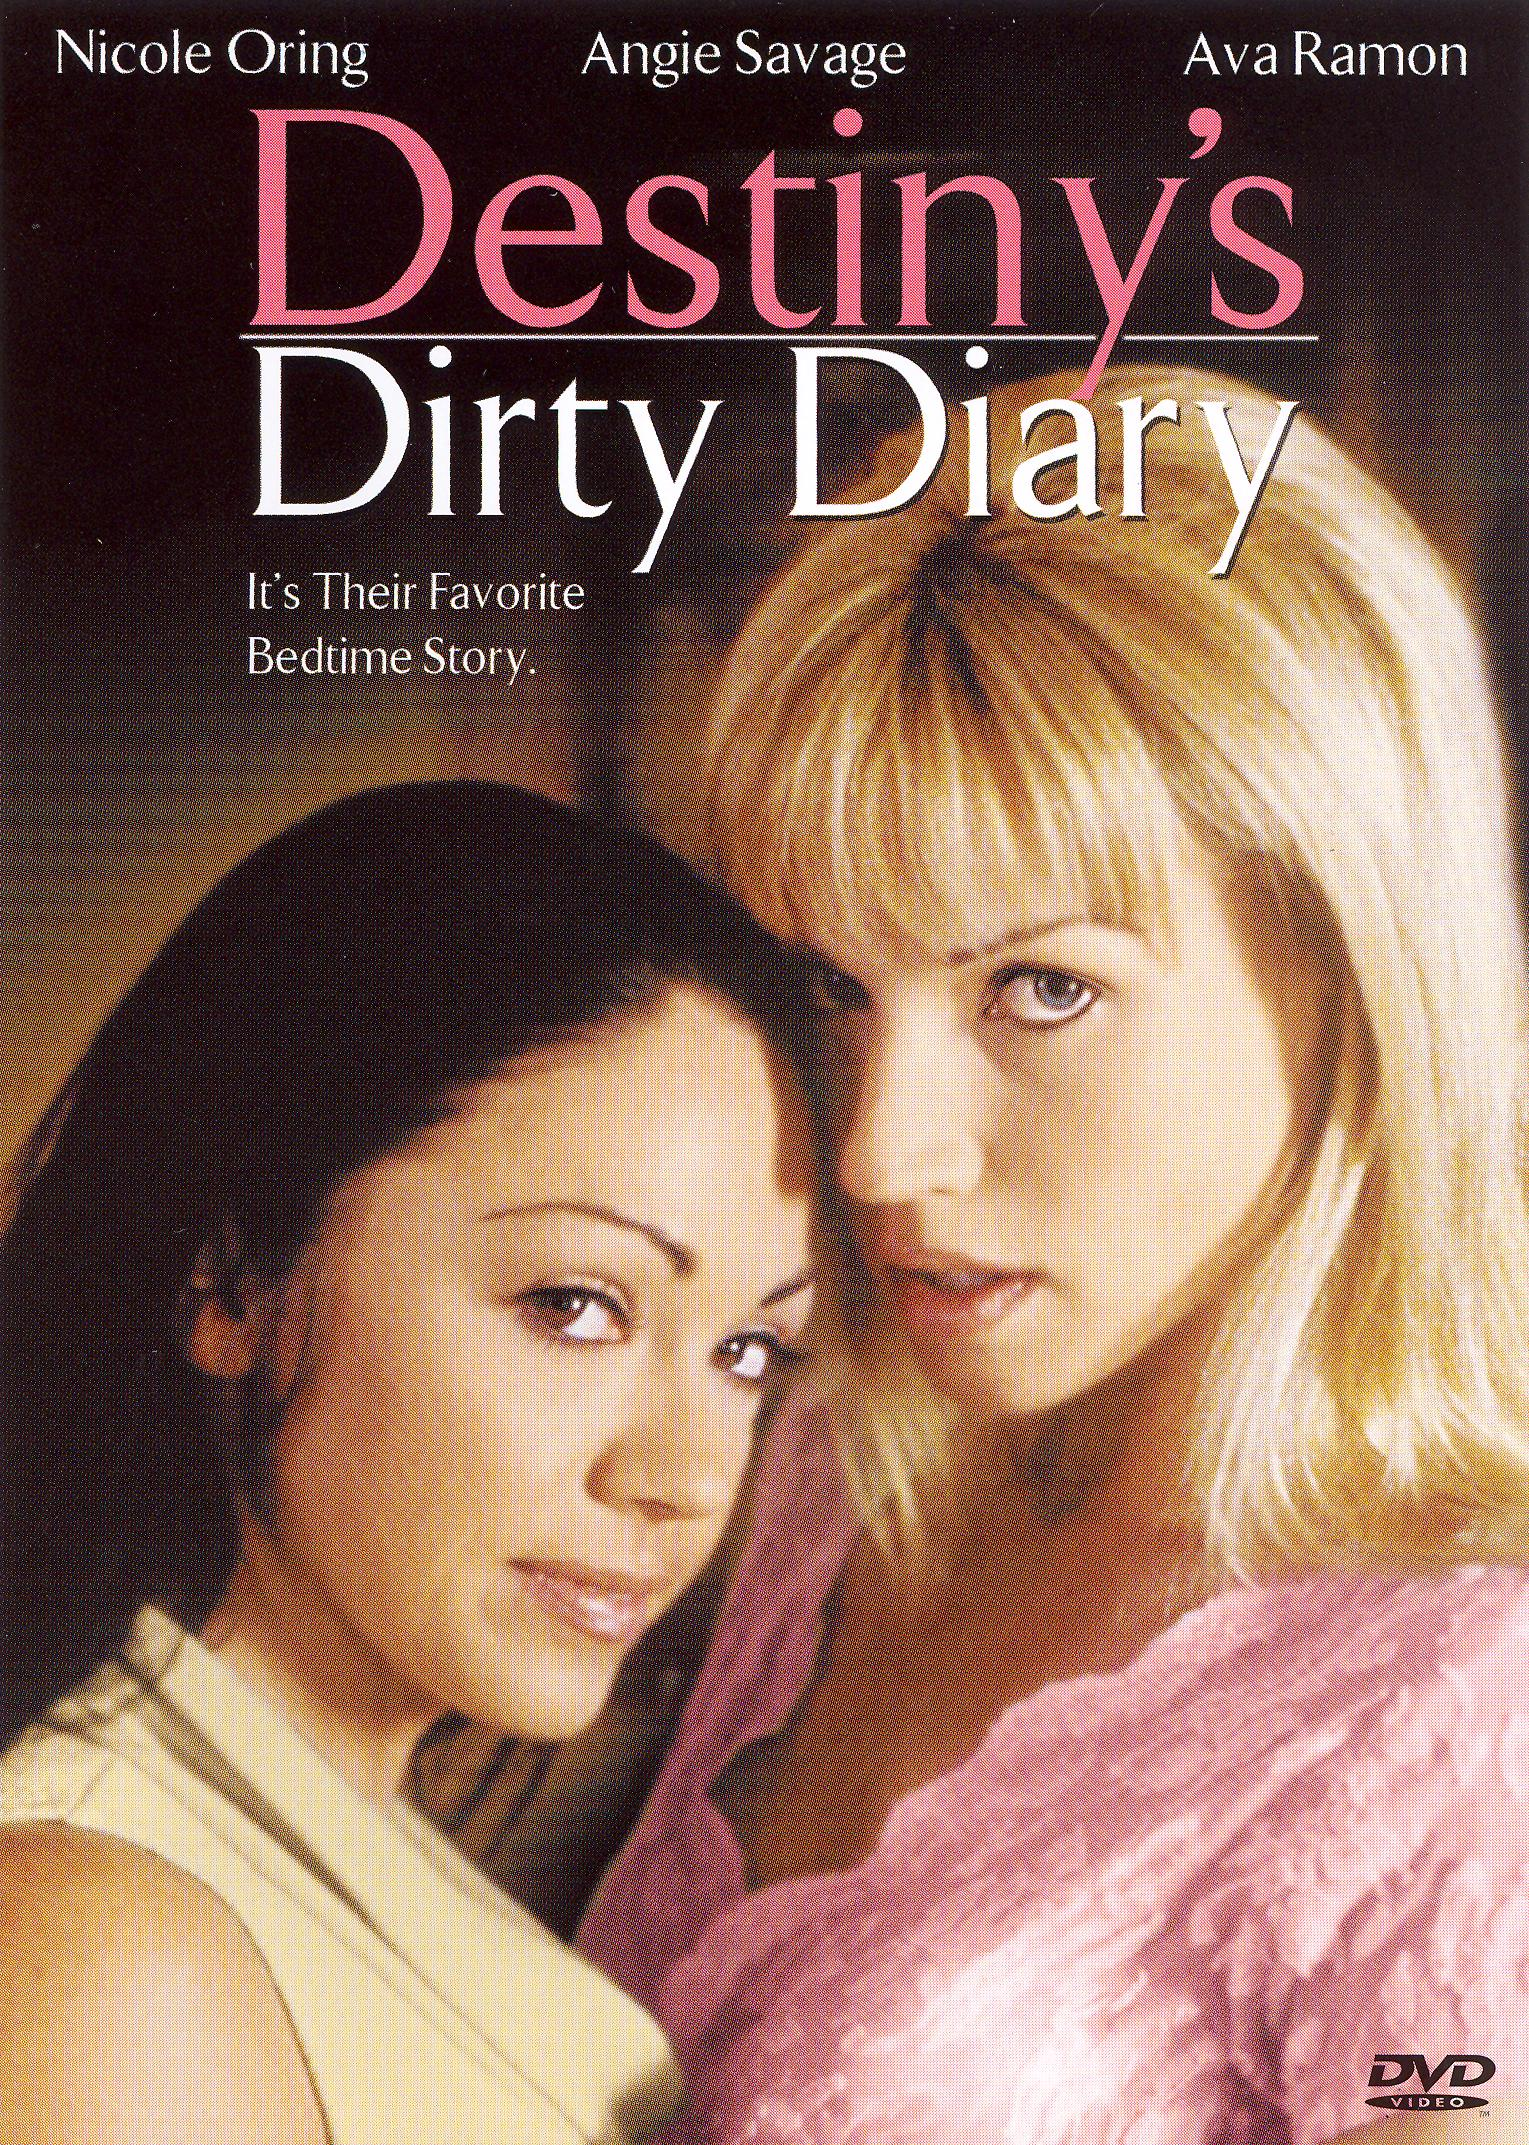 Destiny's Dirty Diary